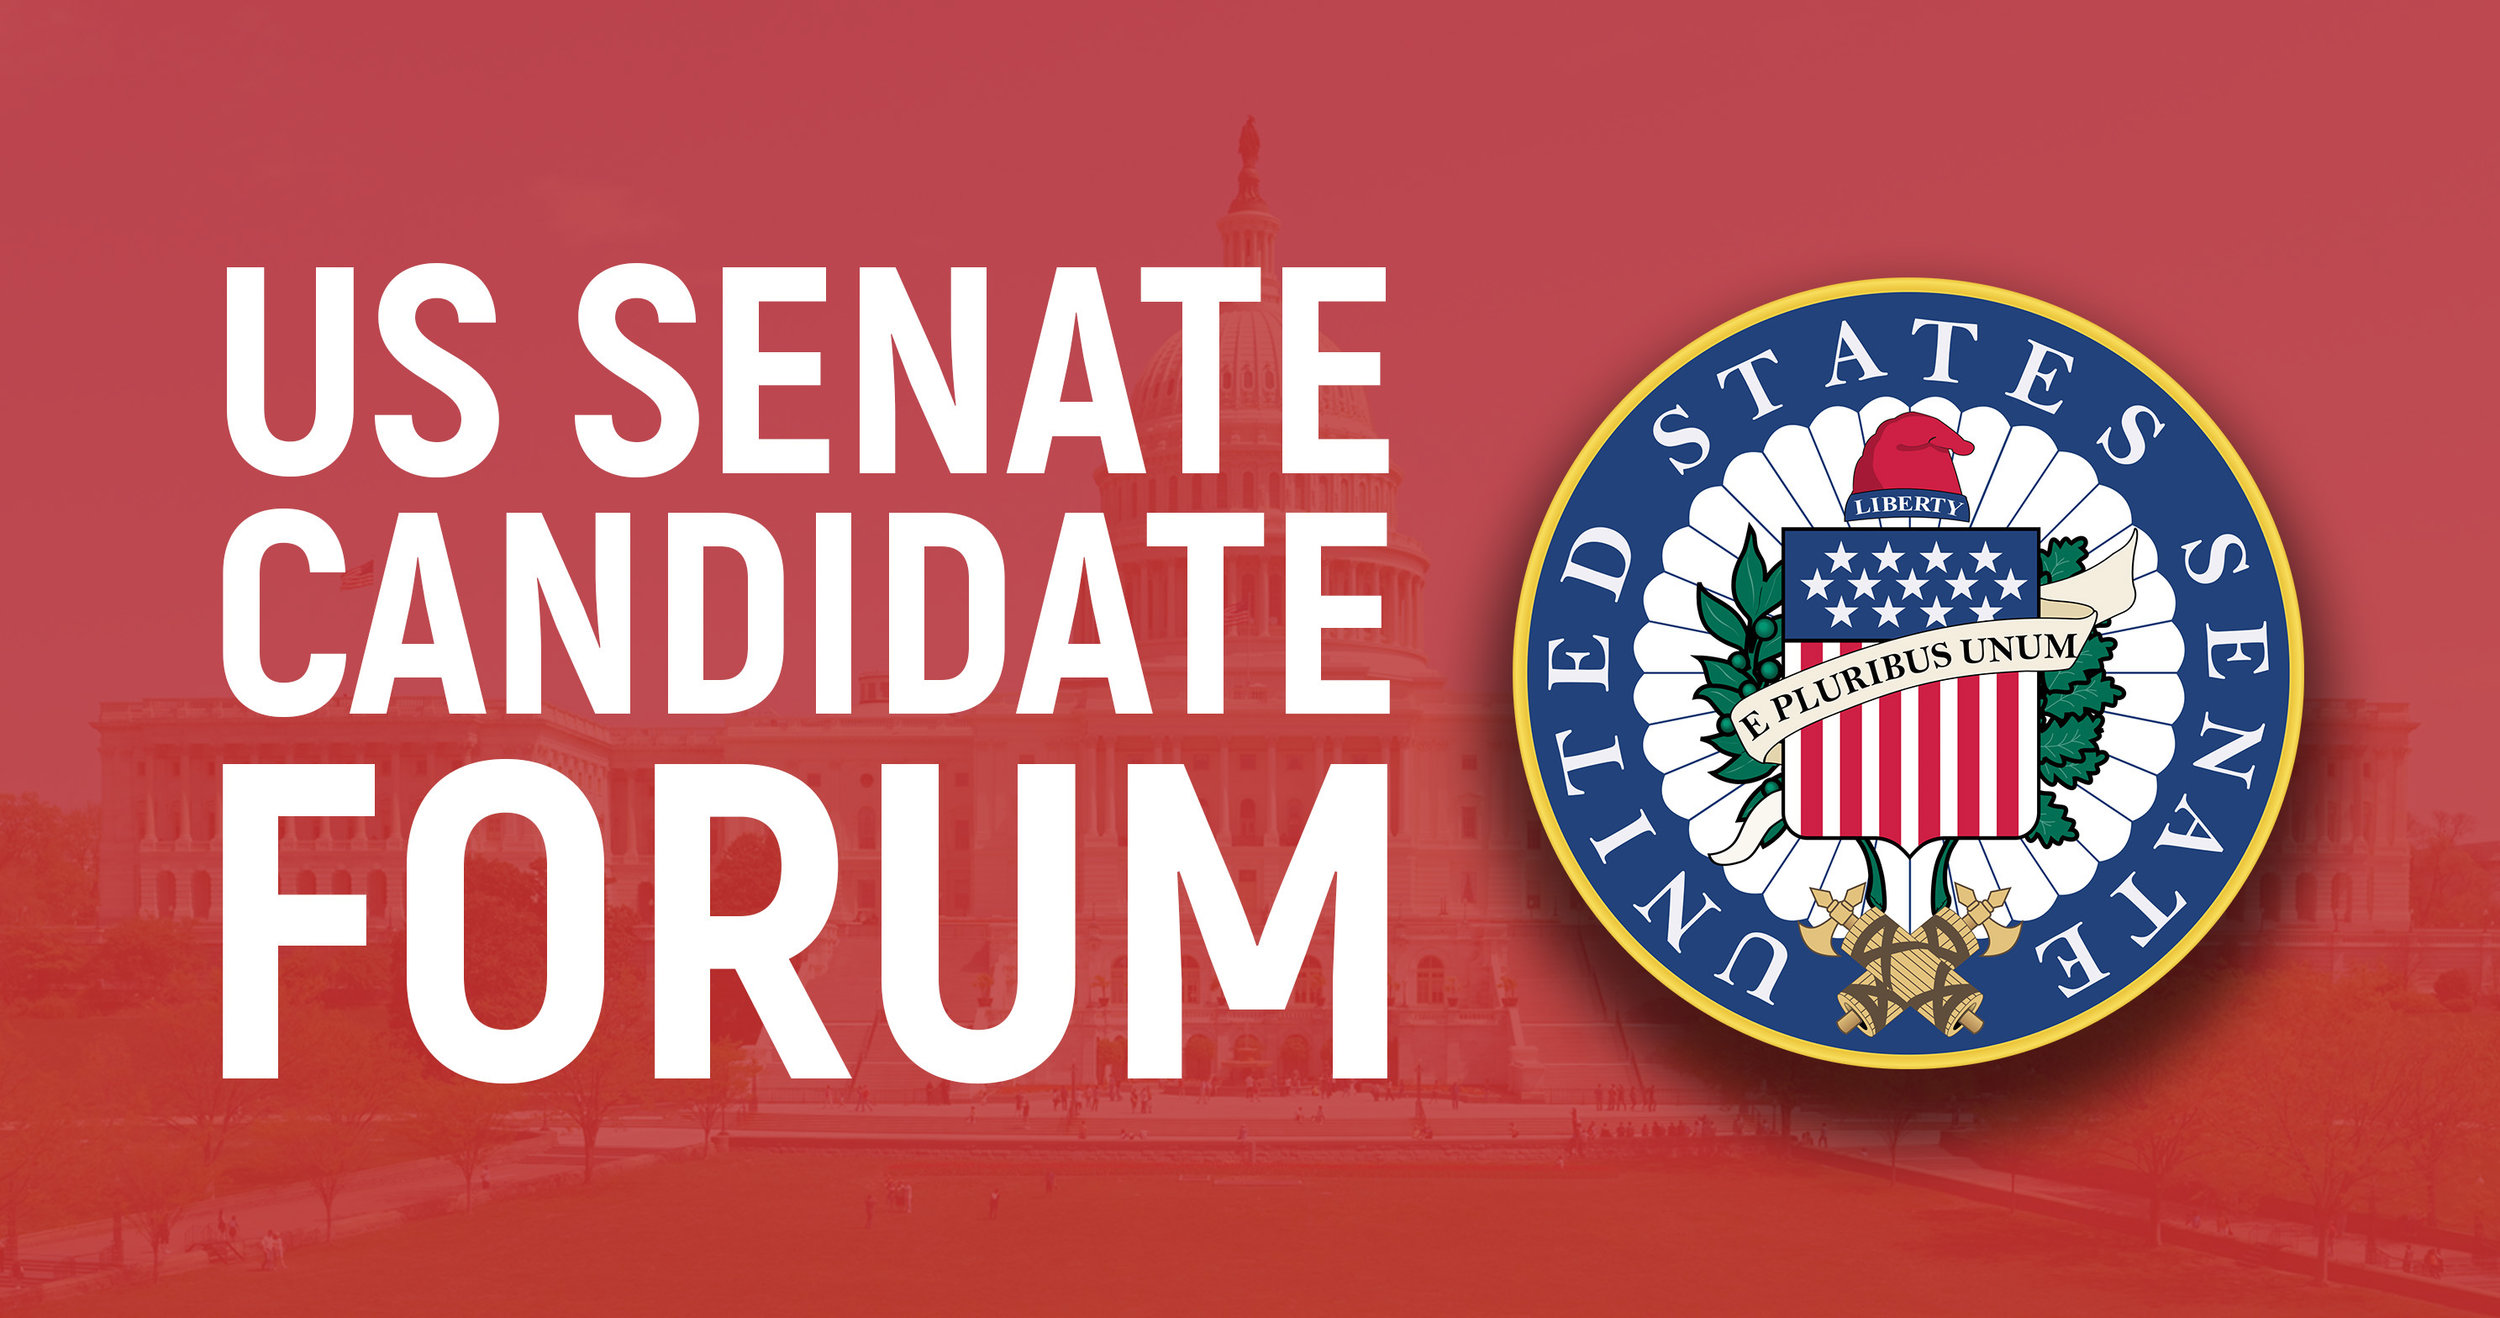 US Senate Candidate Forum.jpg